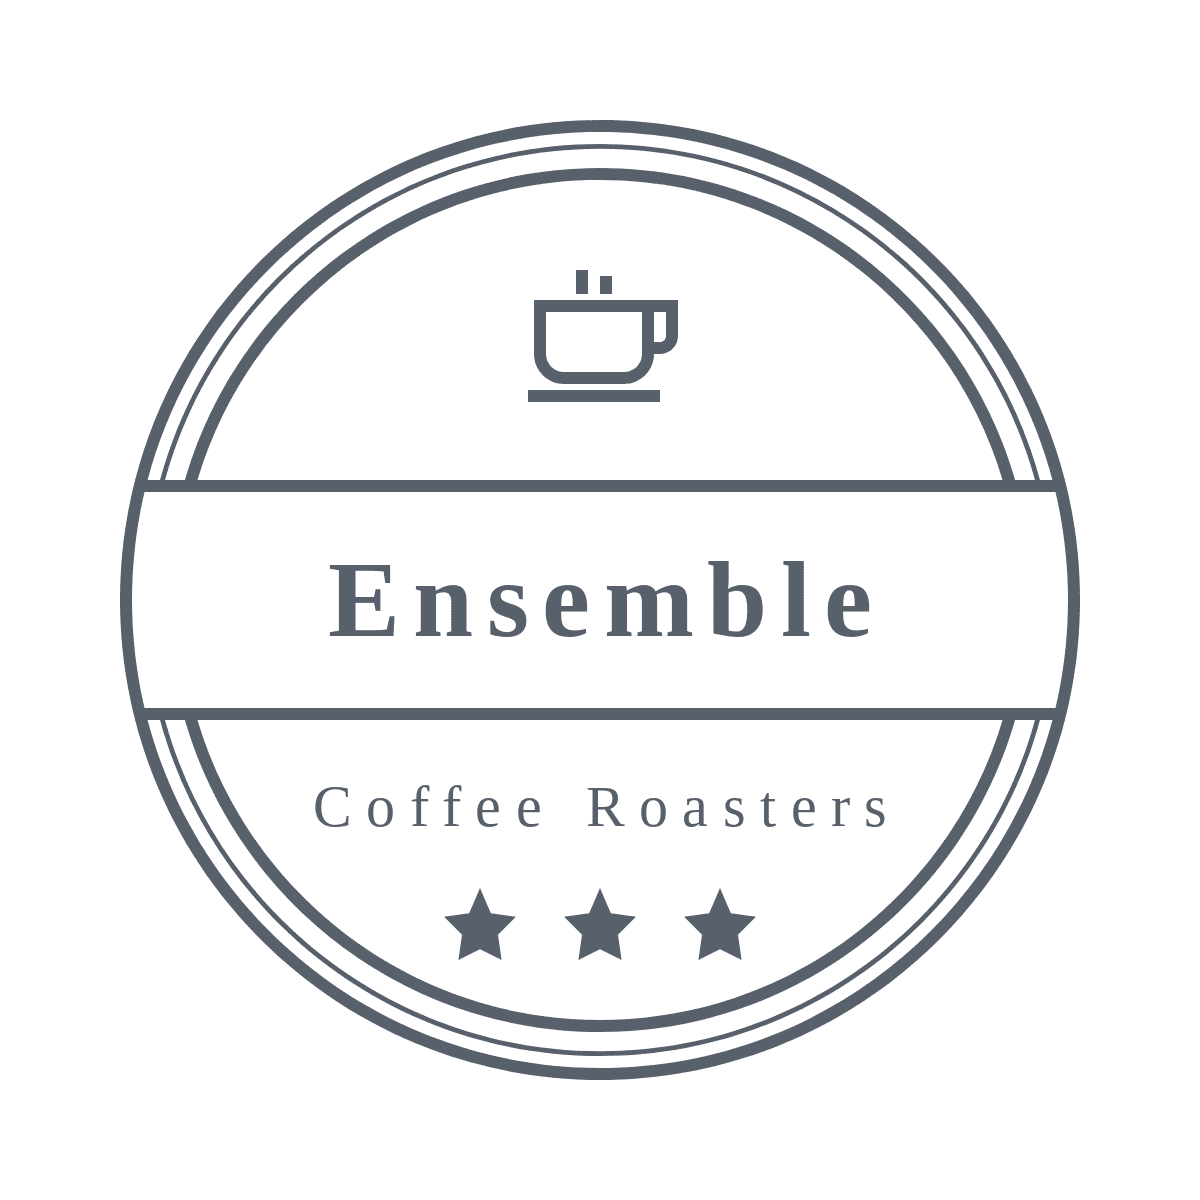 Ensemble Coffee Roasters